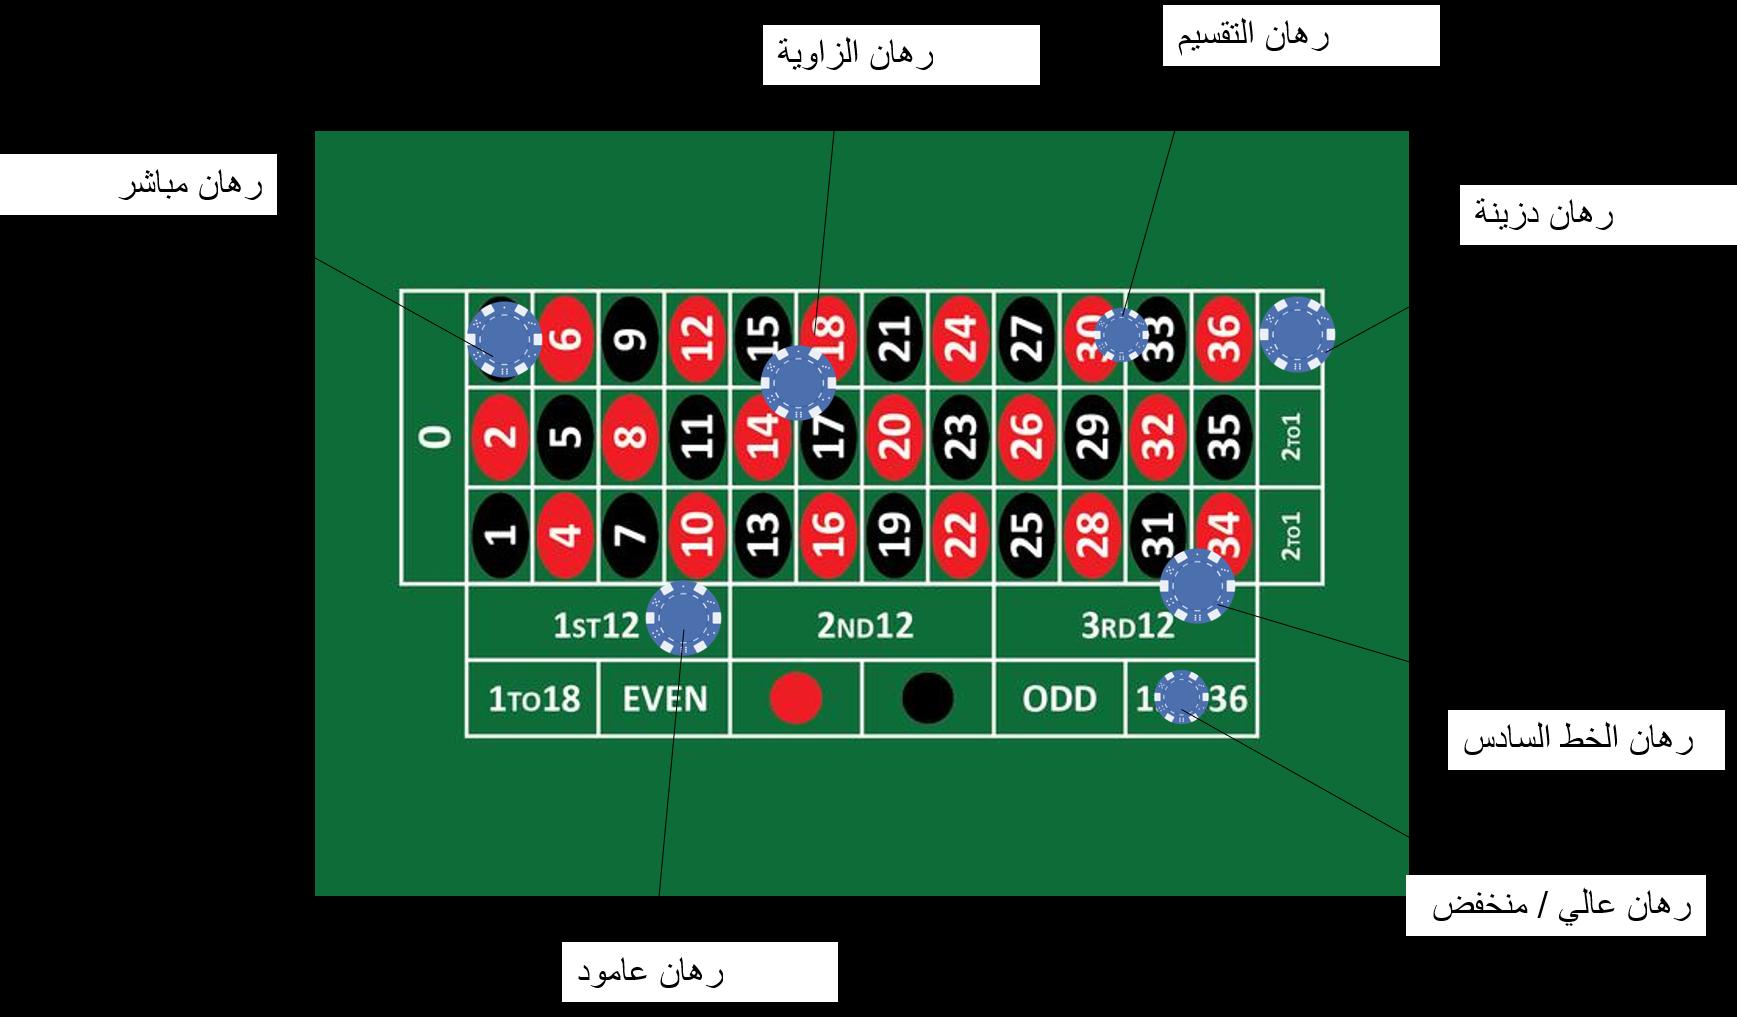 ا استراتيجية 436023